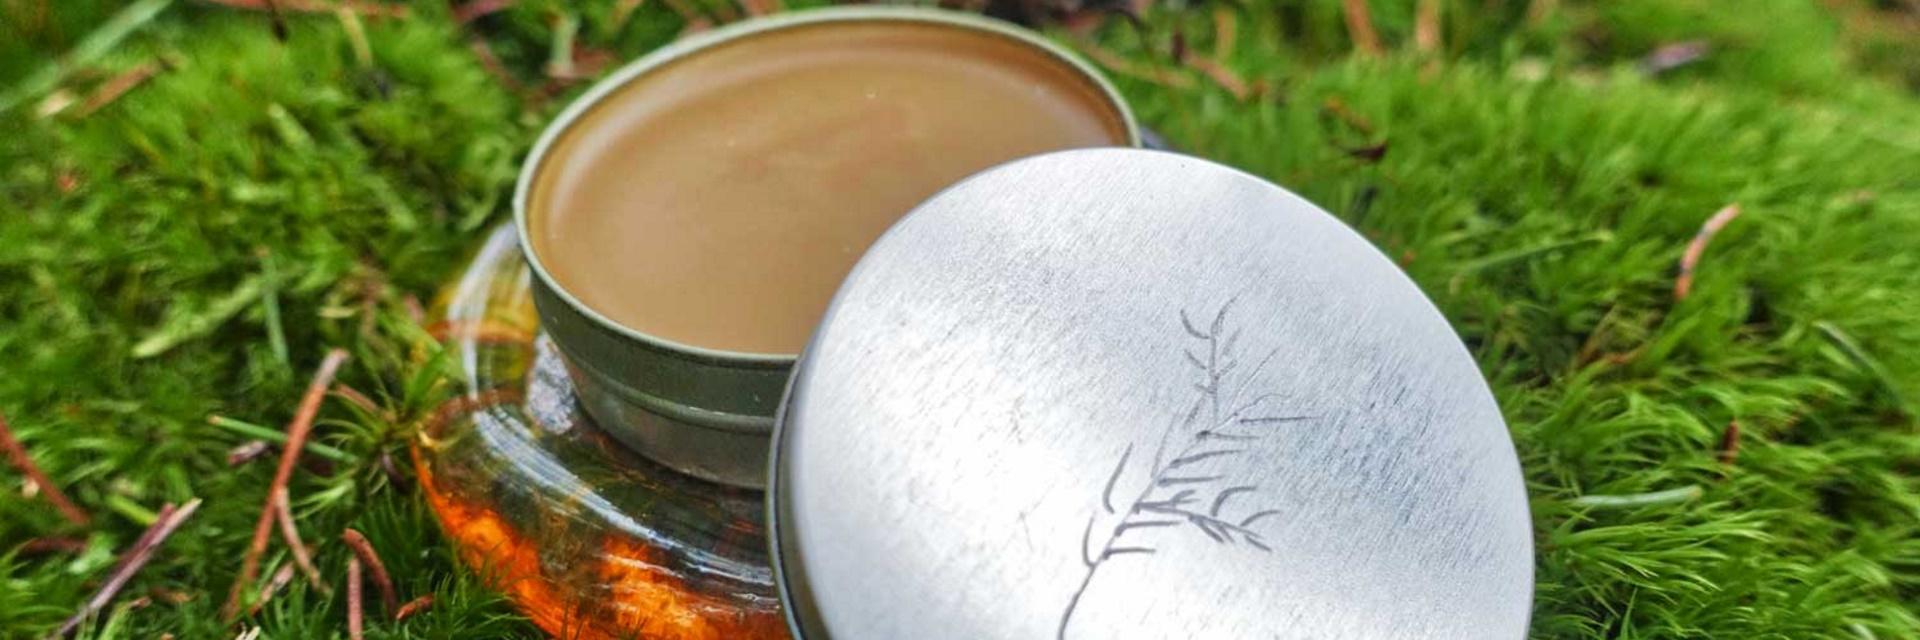 Make your own natural glass souvenir